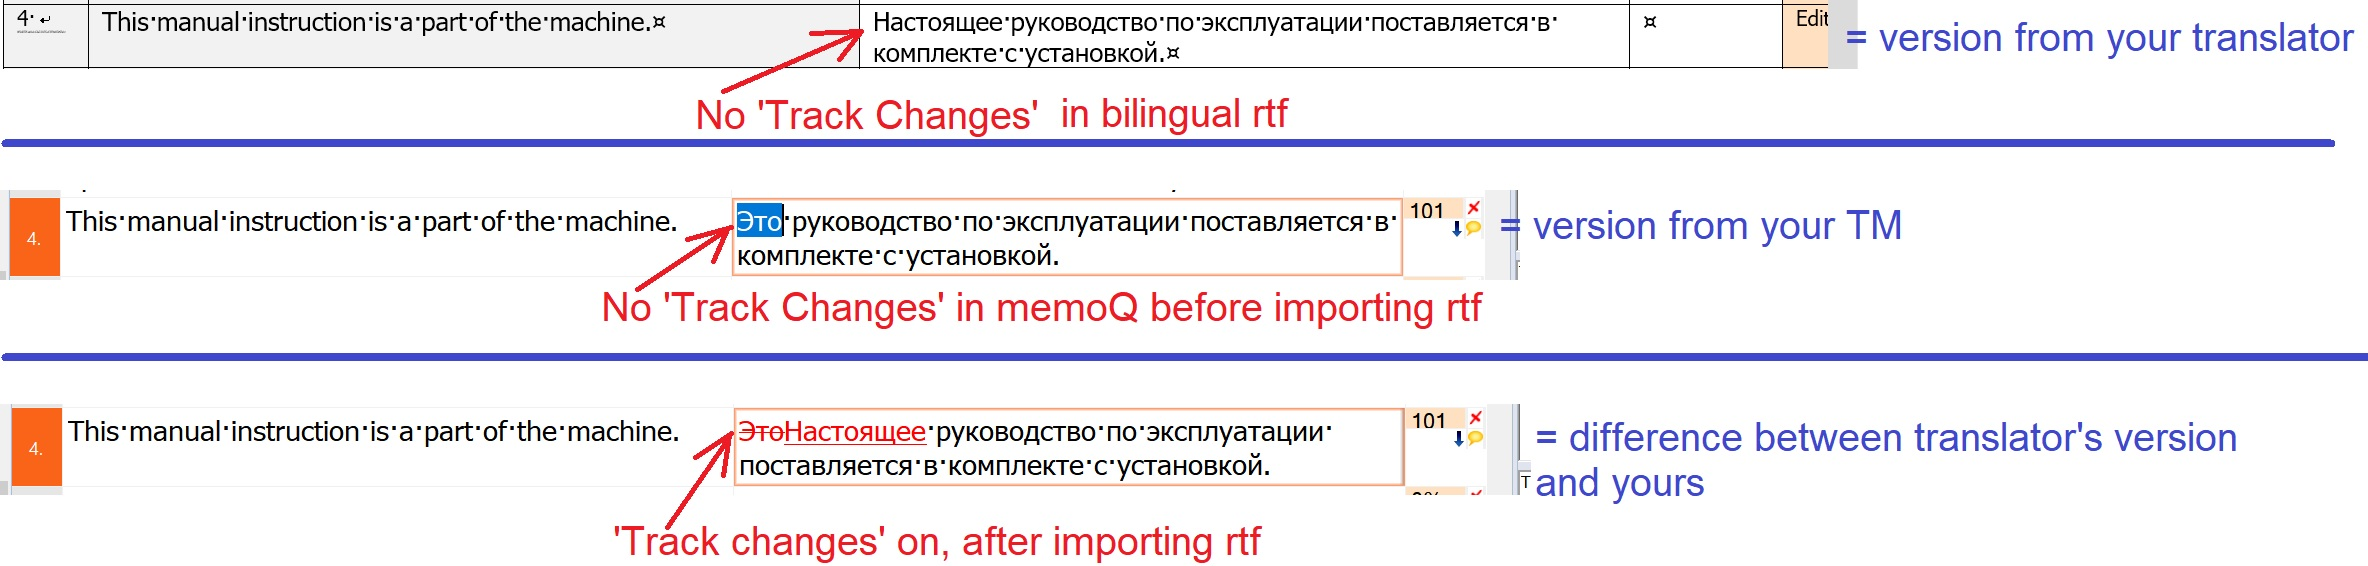 trackchanges.jpg